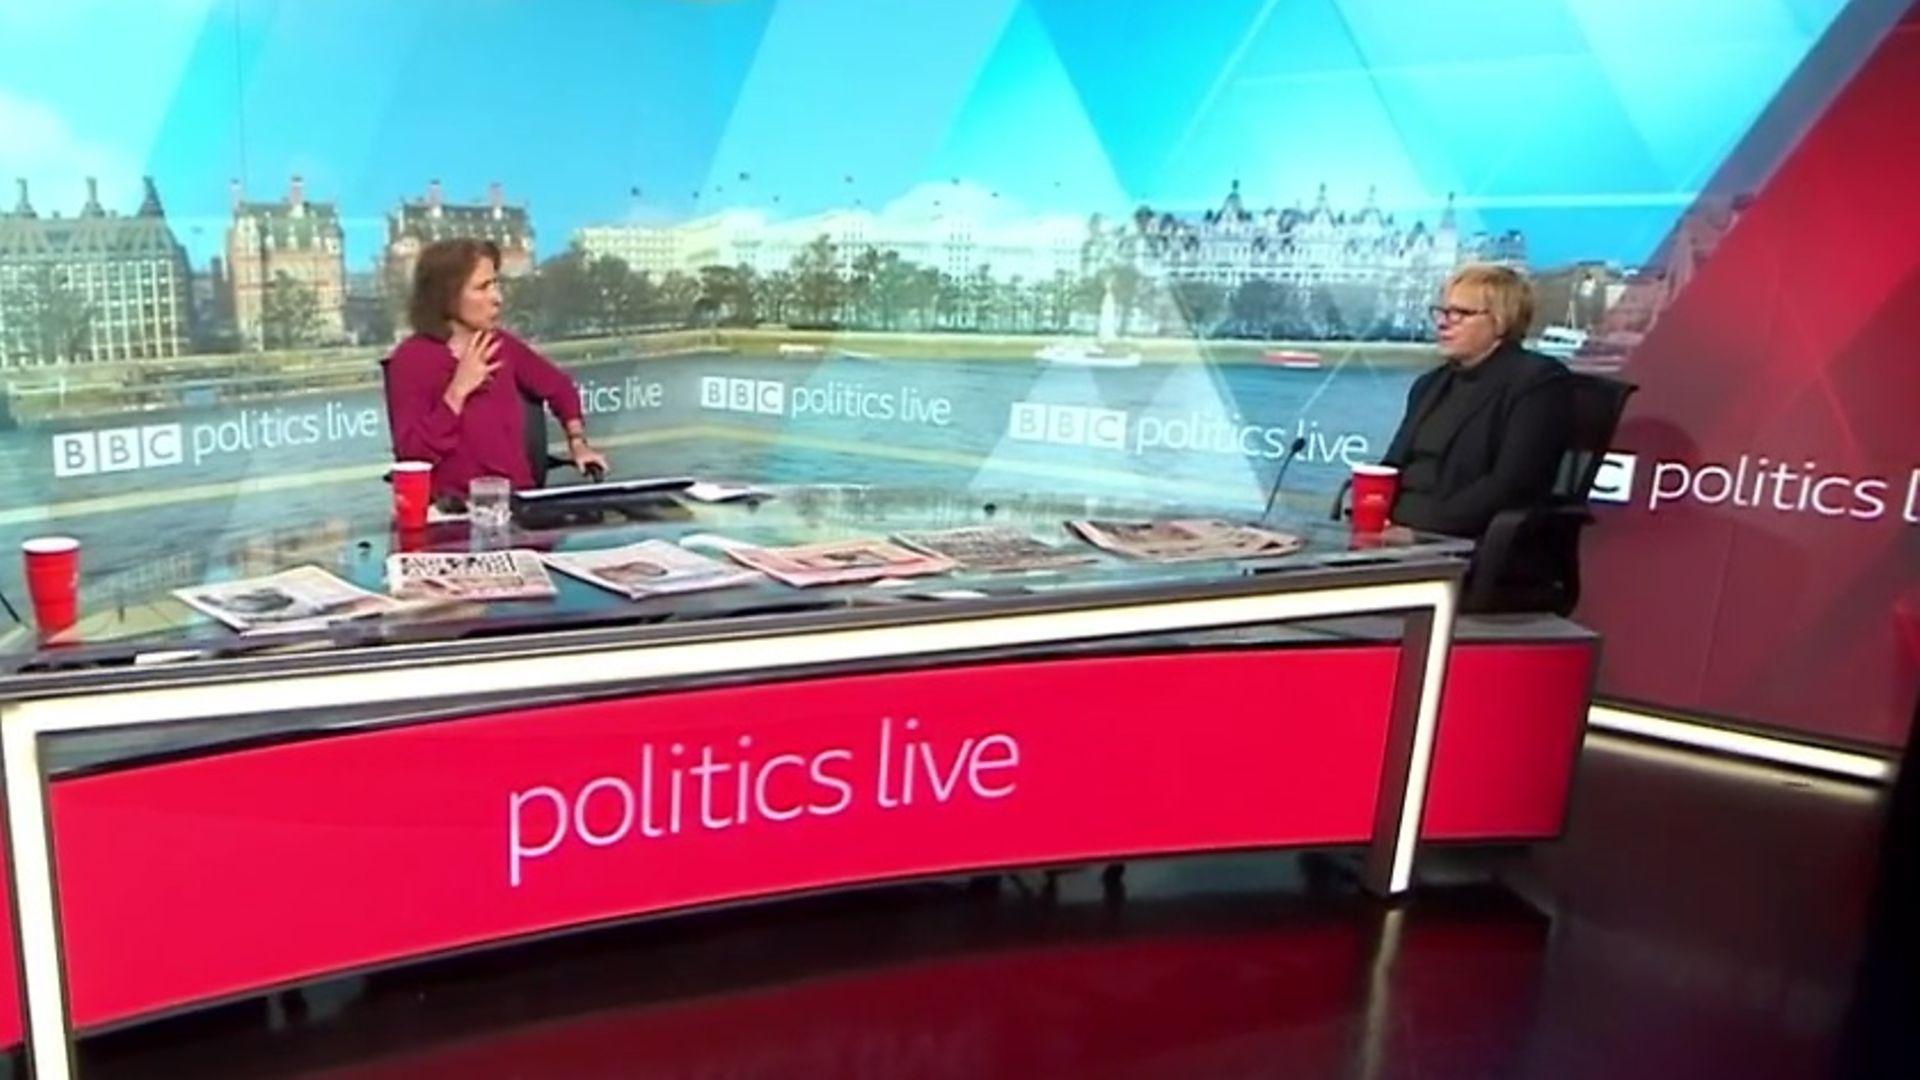 Angela Eagle MP and Jo Coburn disagree over Boris Johnson's Brexit pledge on Politics Live - Credit: BBC